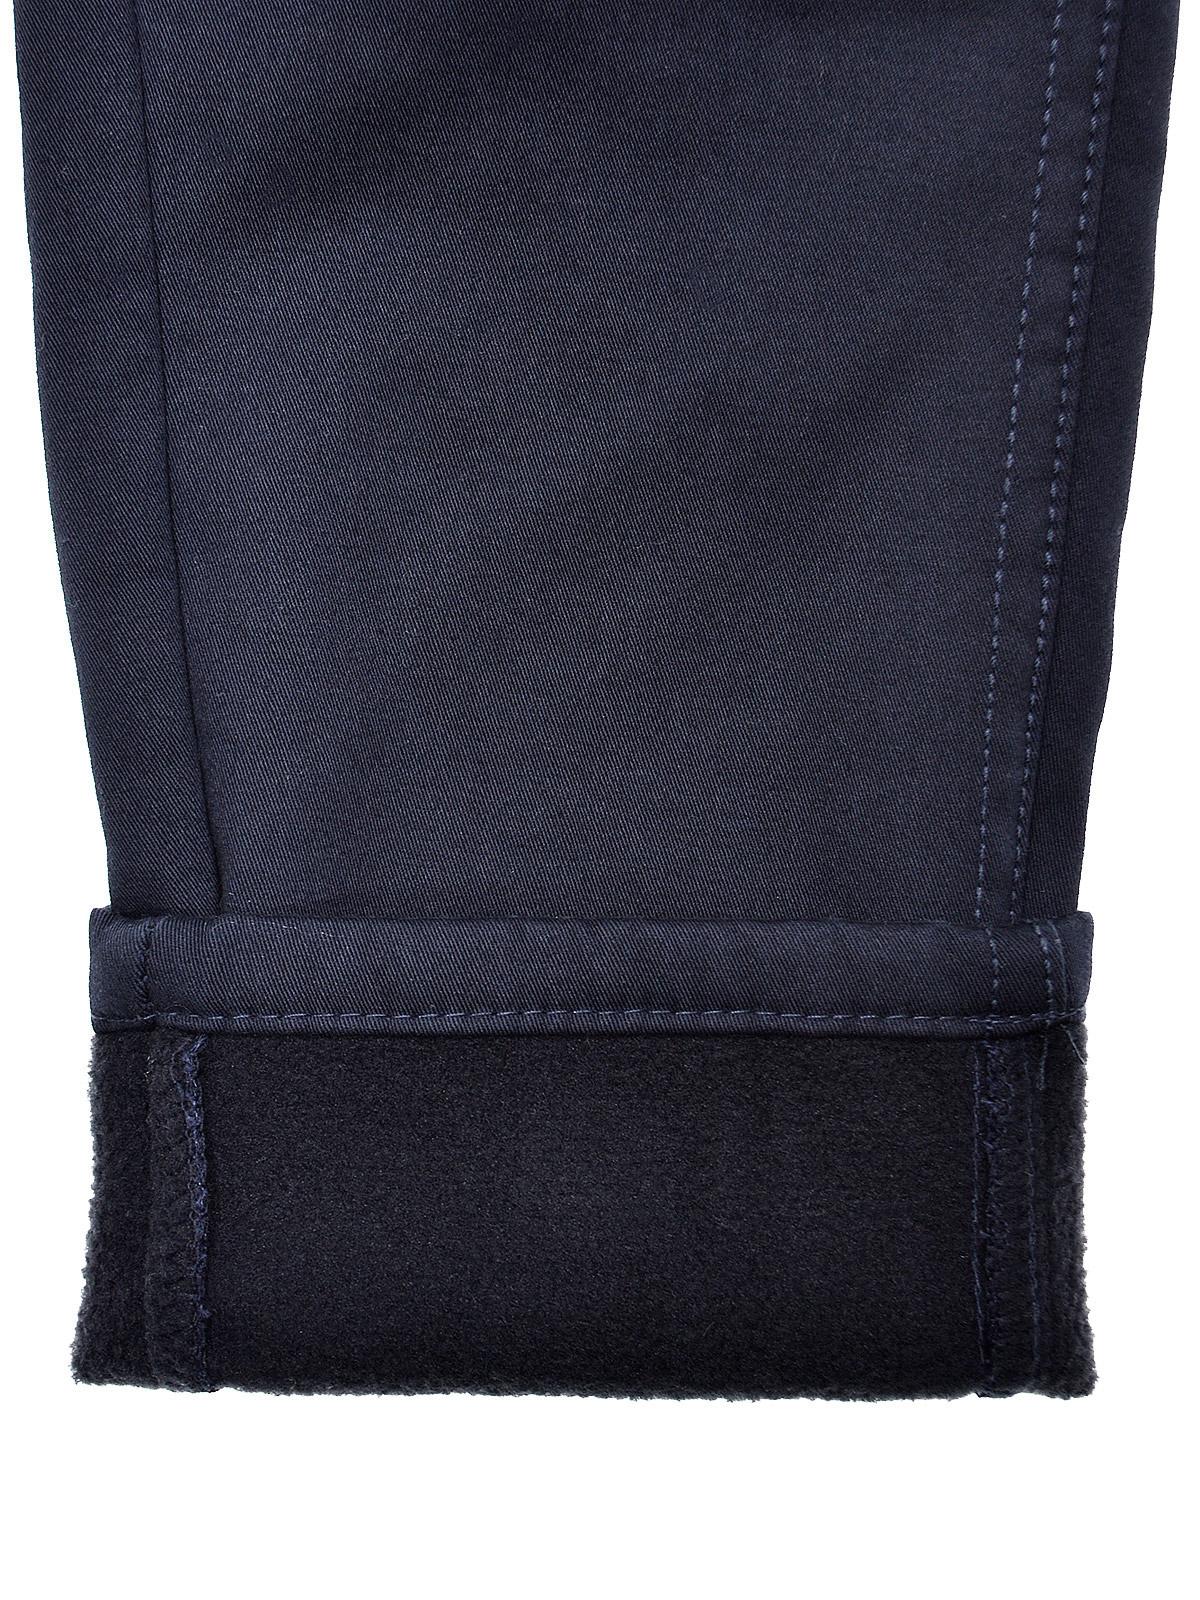 Enfants-Chino-THERMO-d-039-hiver-Pantalons-Garcons-Pantalon-Doublure-Stretch-Reglable-22904 miniature 14